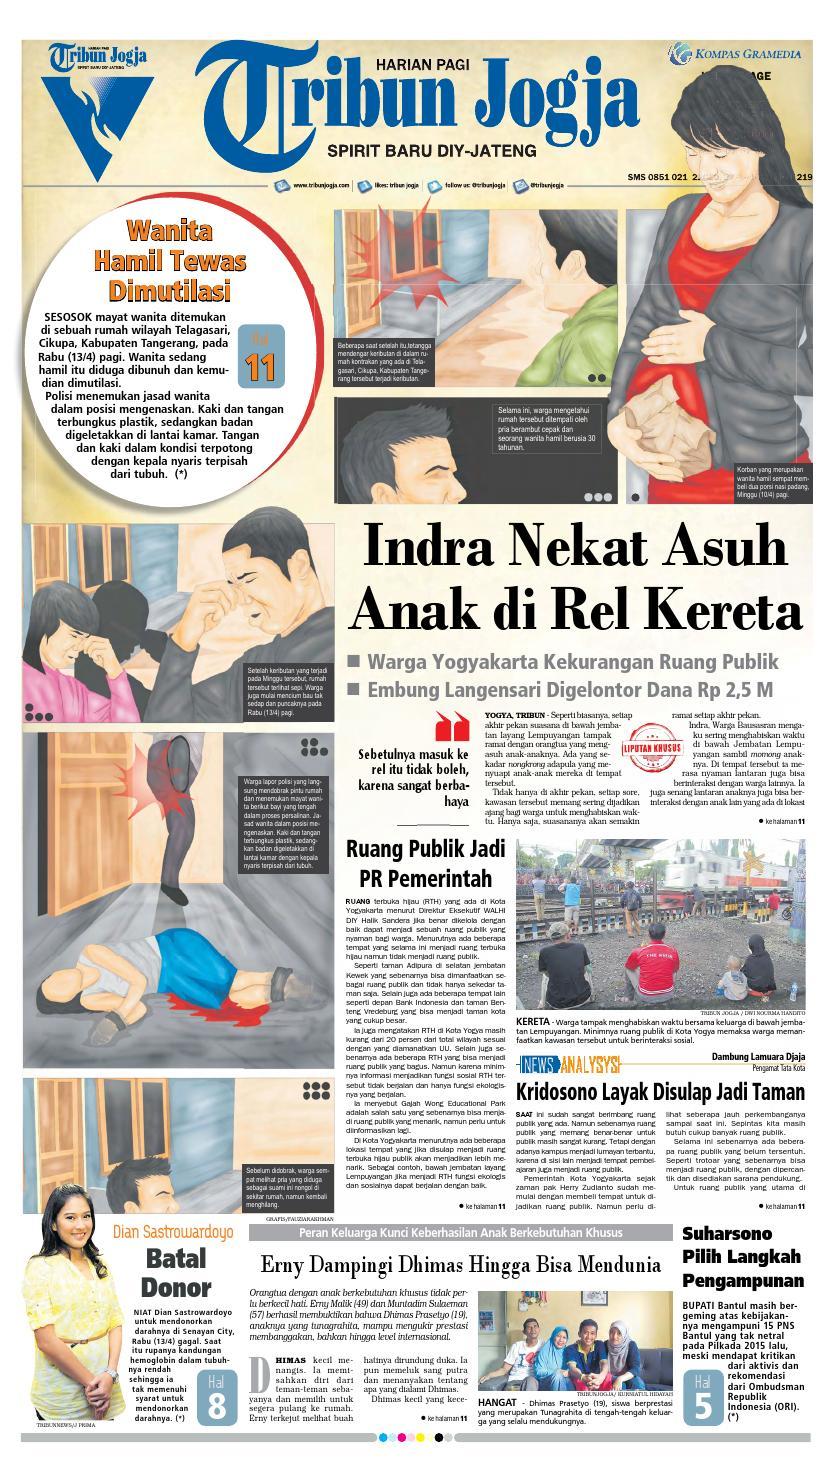 Tribunjogja 14 04 2016 By Tribun Jogja Issuu Produk Ukm Bumn Jamu Kunyit Asam Seger Waras